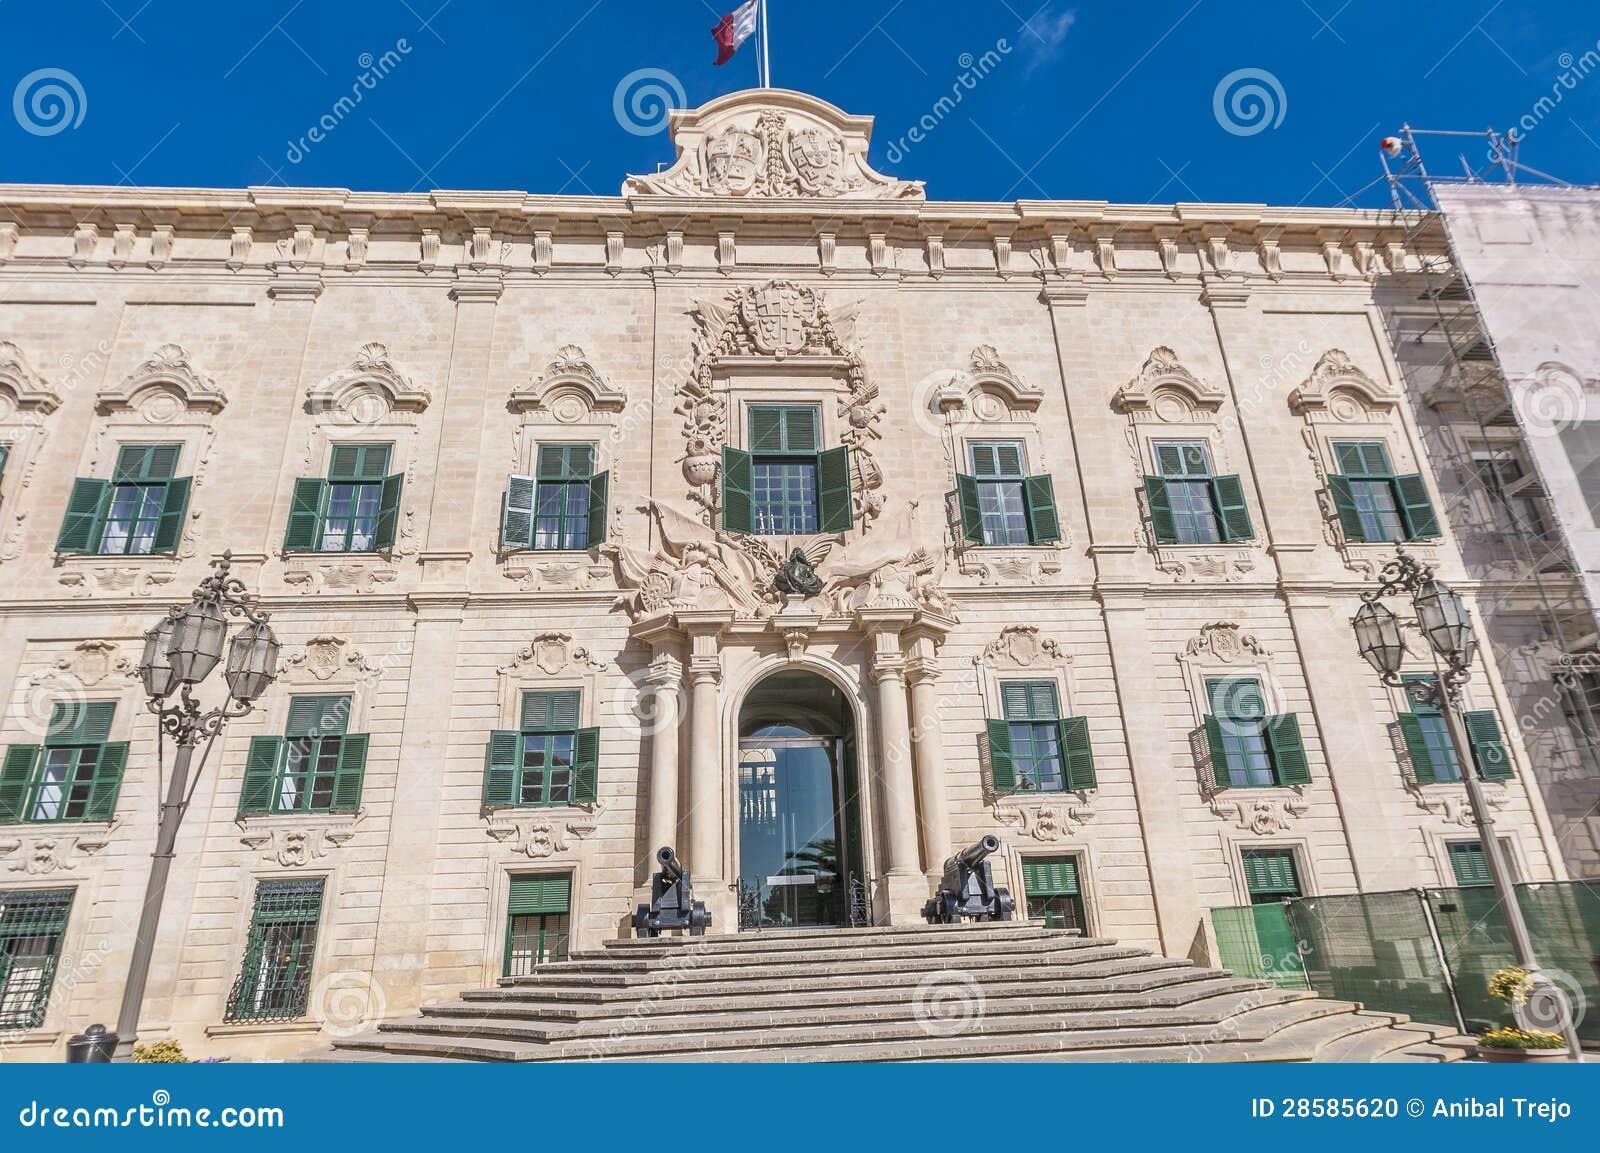 The Auberge De Castille In Valletta, Malta Stock Photo - Image of ...